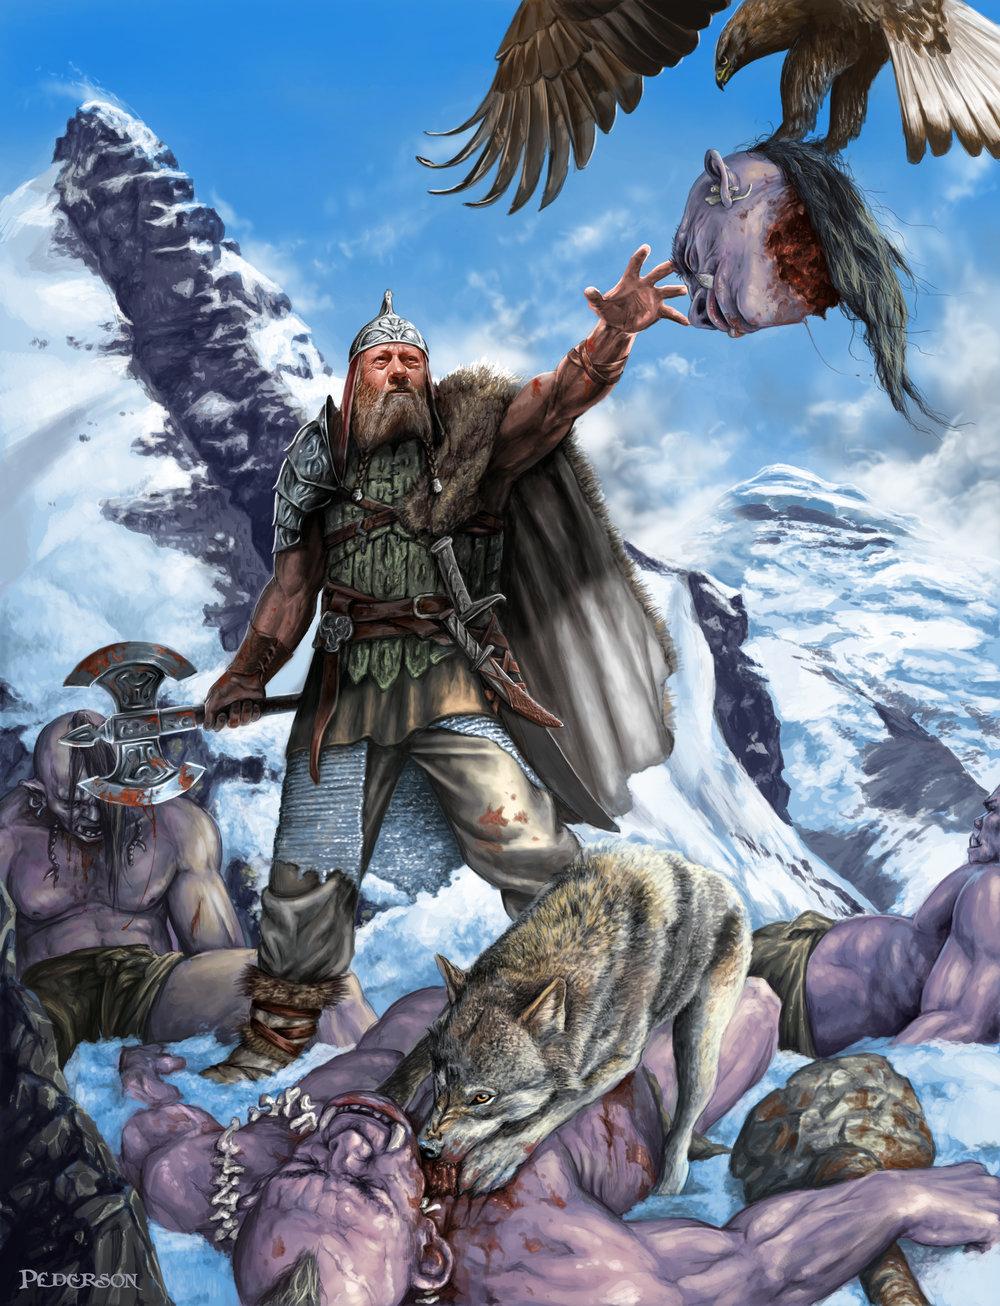 Erik the Conquerer